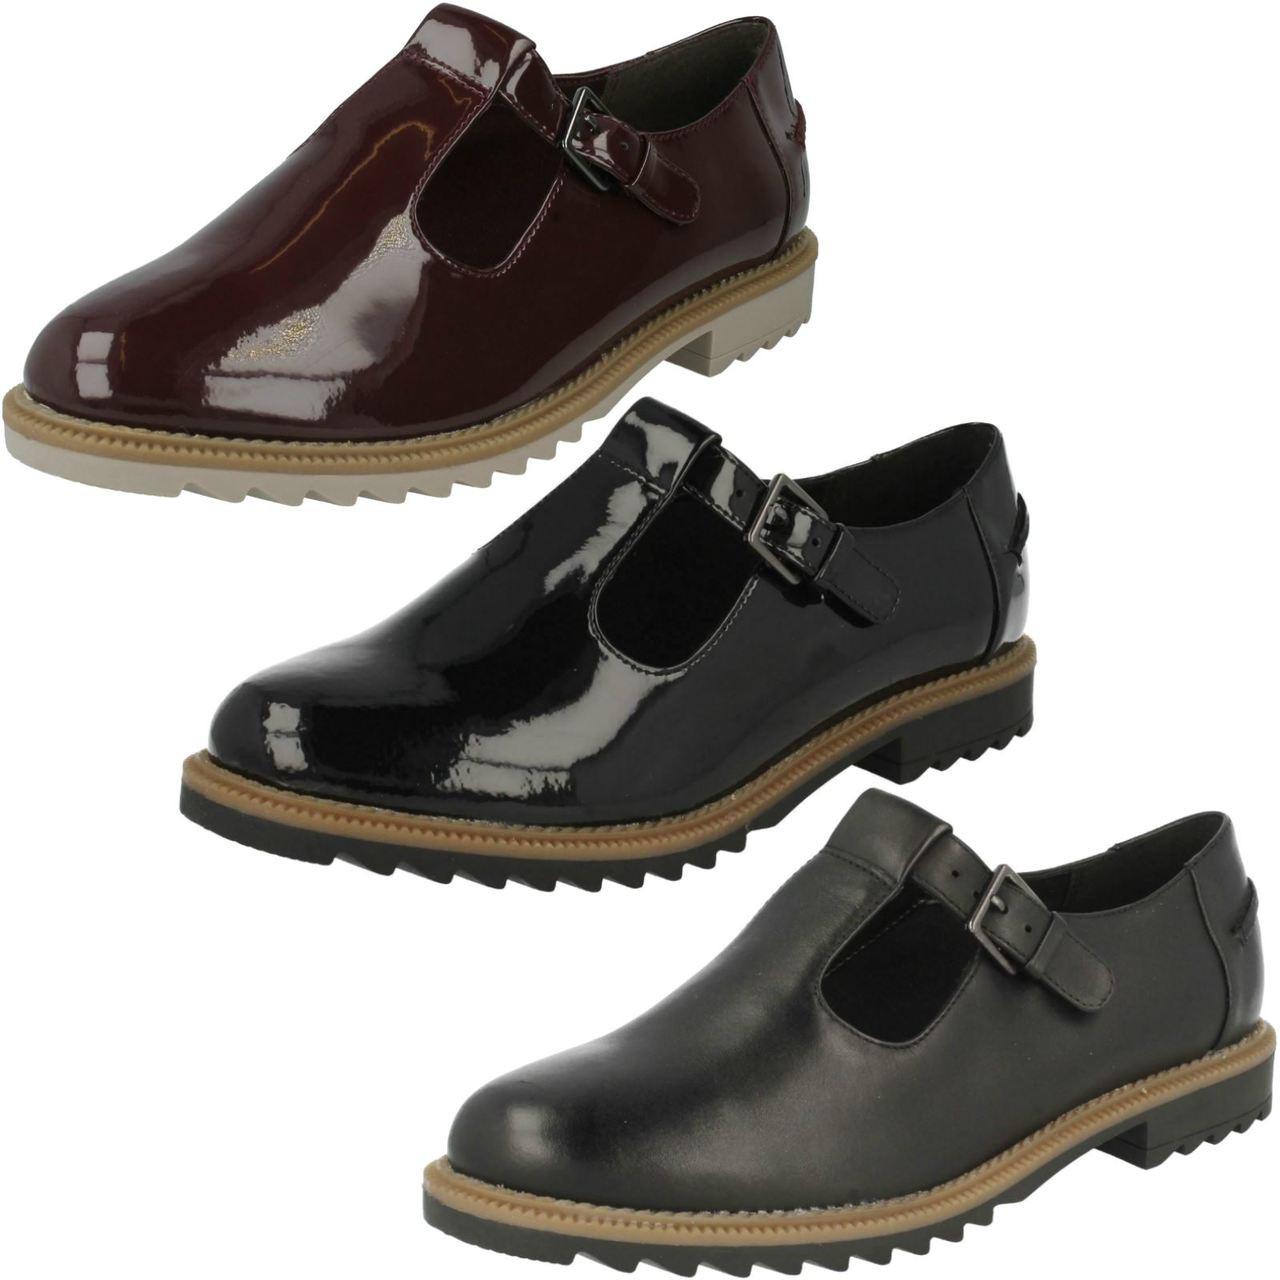 Ladies Clarks T-Bar Buckle Flat Shoes